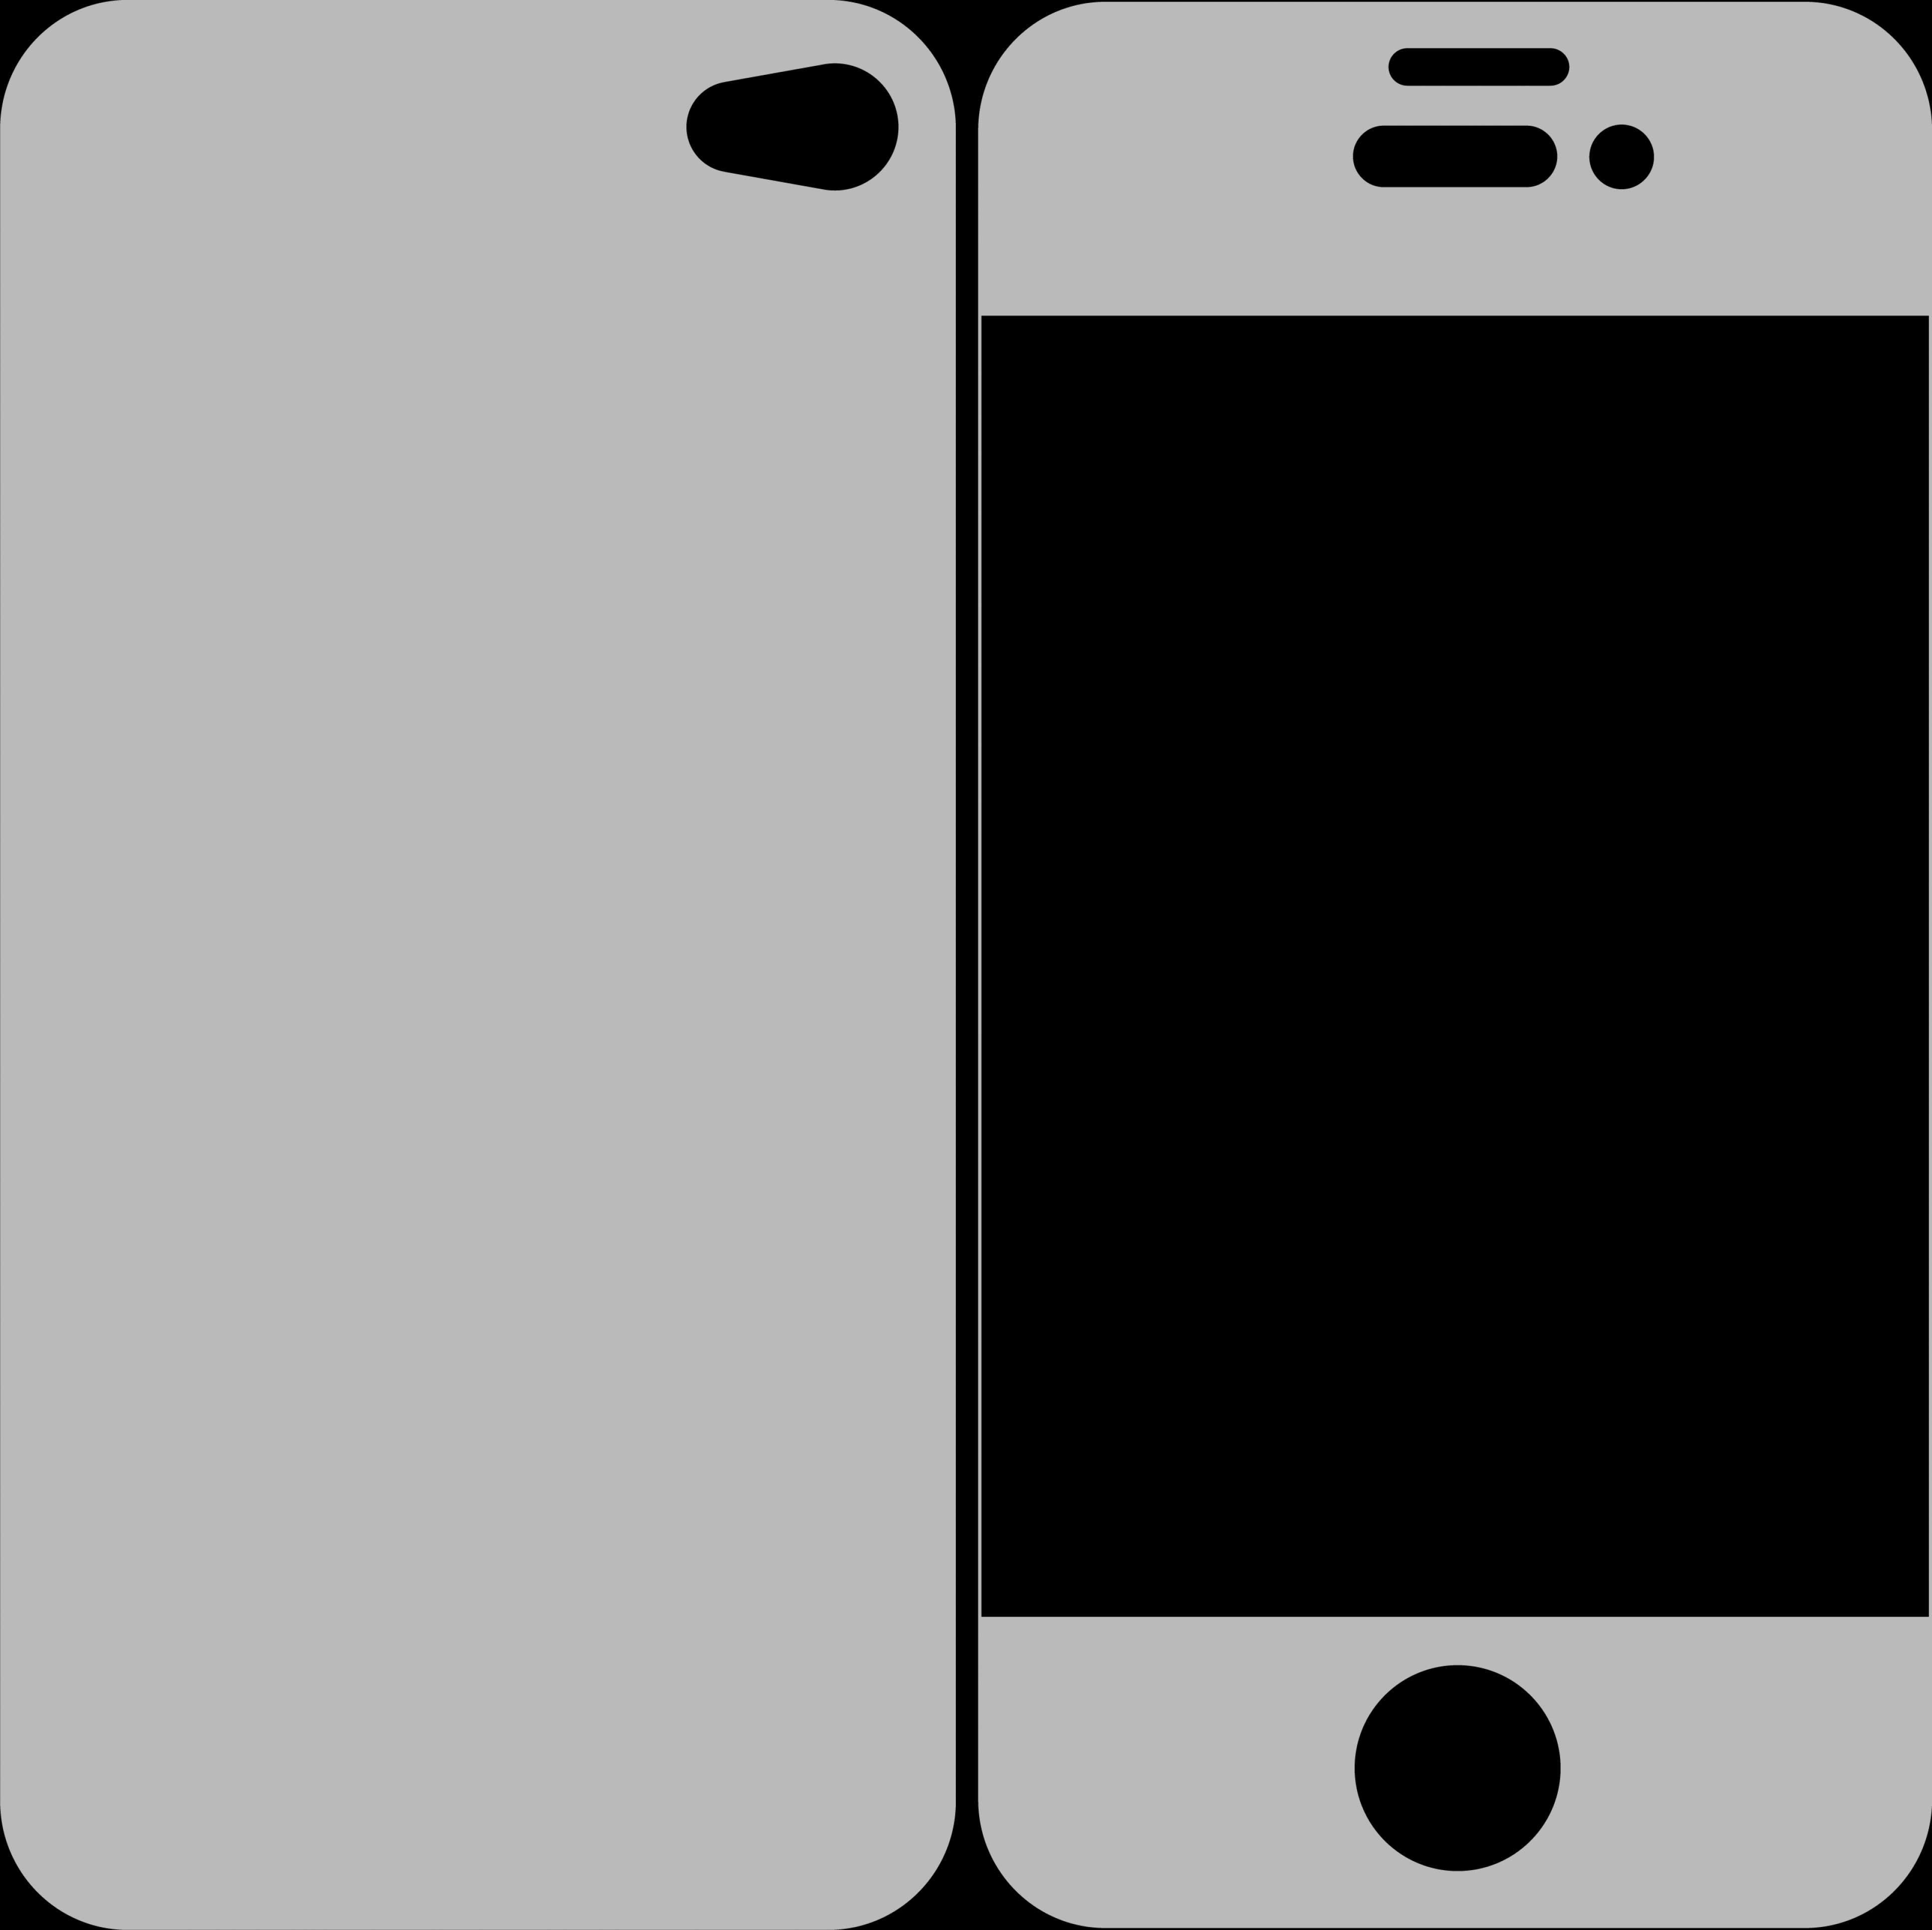 3871x3867 Images Of Iphone Vector Template Download Lazttweet